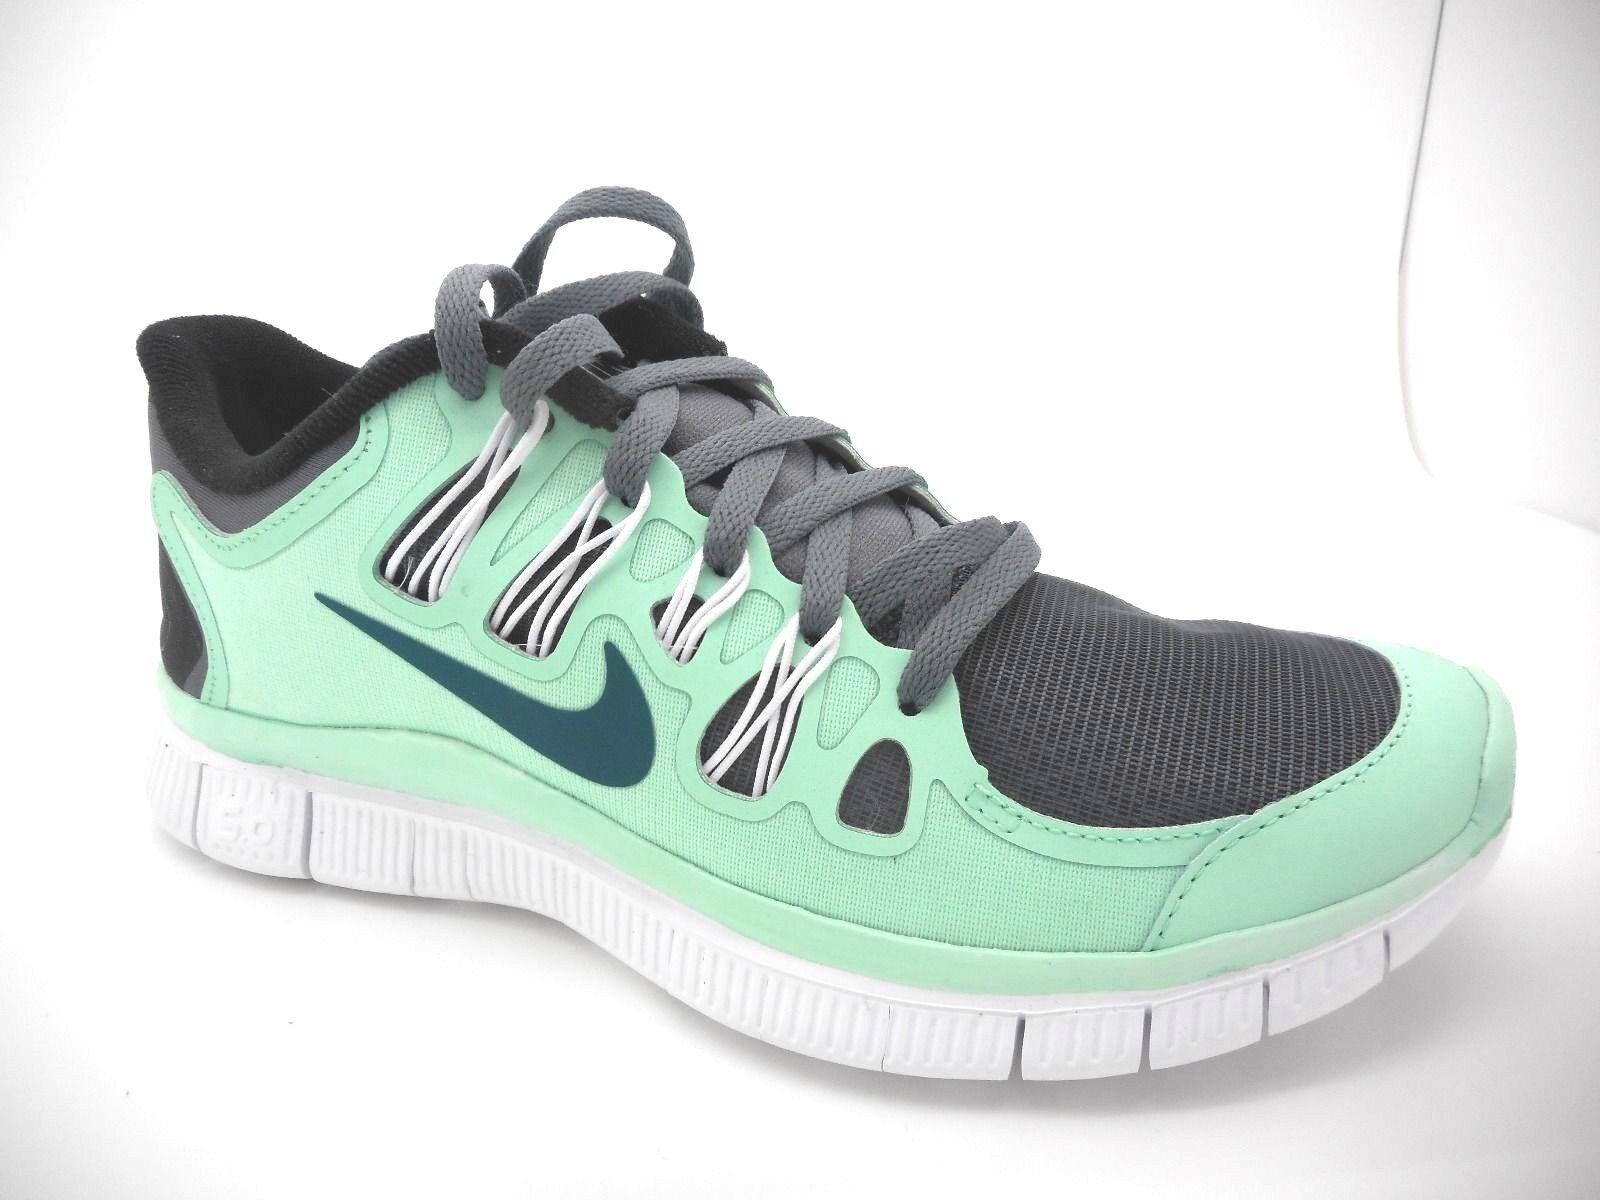 Womens Nike Free 5.0 Shield iD  Multi-color Run SZ 6 (641462-992)